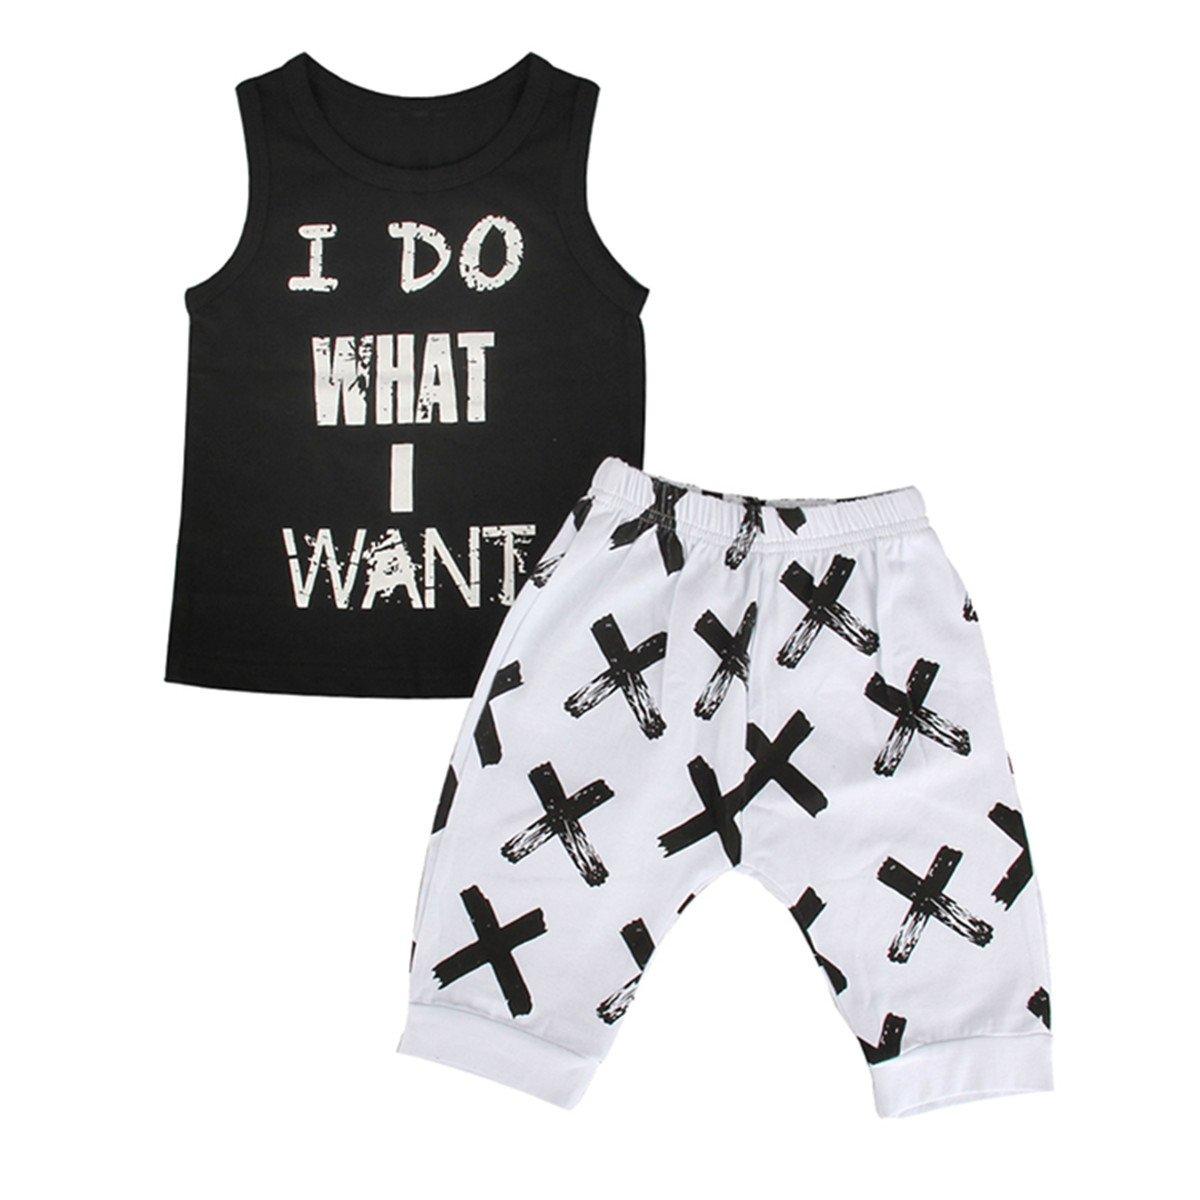 2pcs Toddler Kids Baby Boy Cool Sleeveless T-shirt Vest+Pants Clothes Outfit Set (2T-3T)